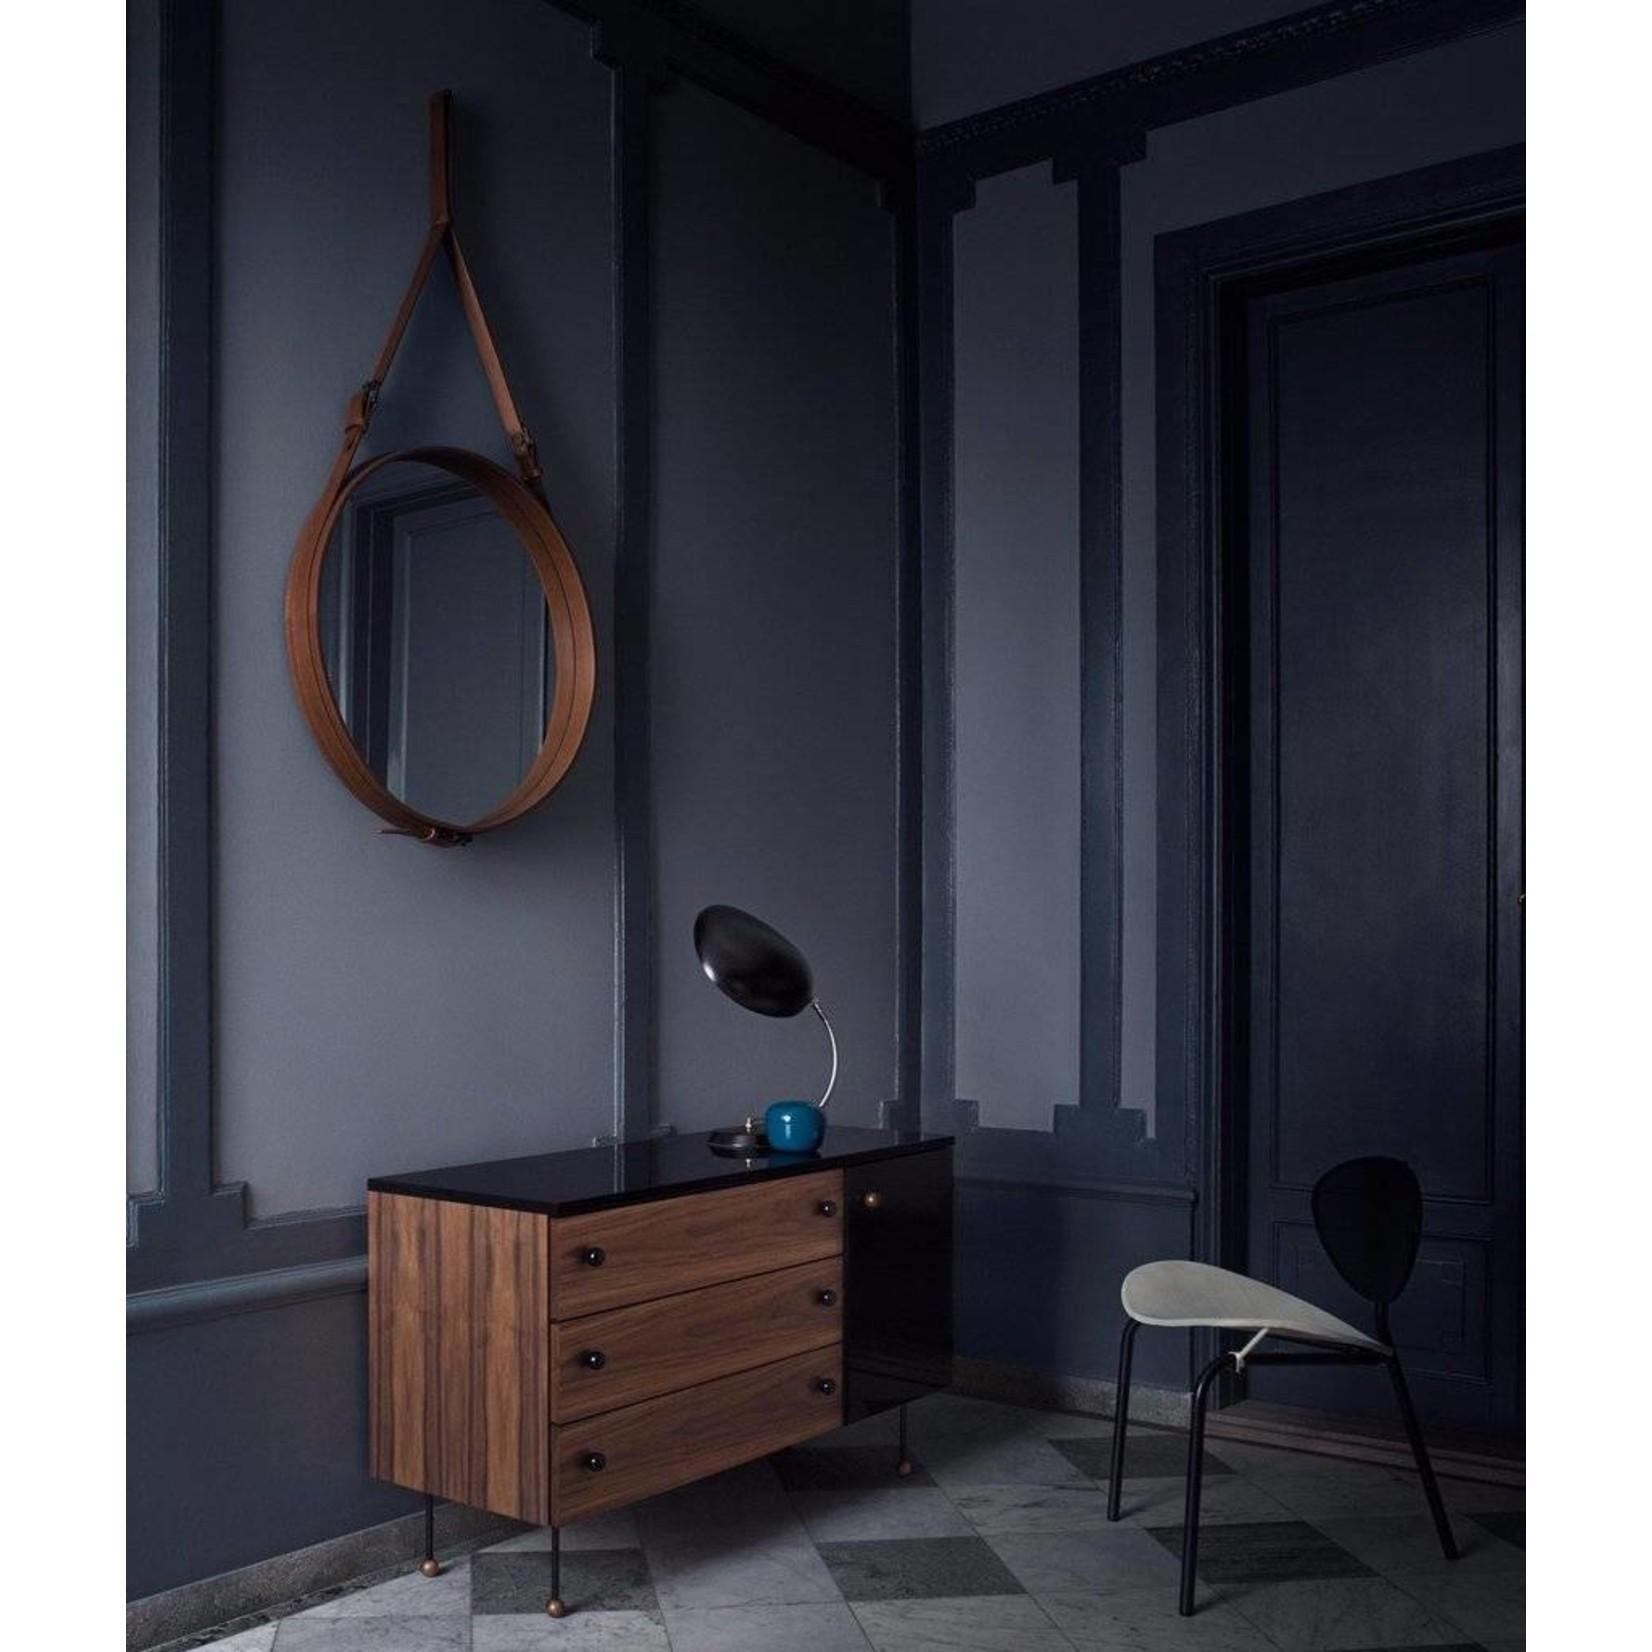 Gubi Wall mirror Adnet - Round - Ø70 - Tan Leather